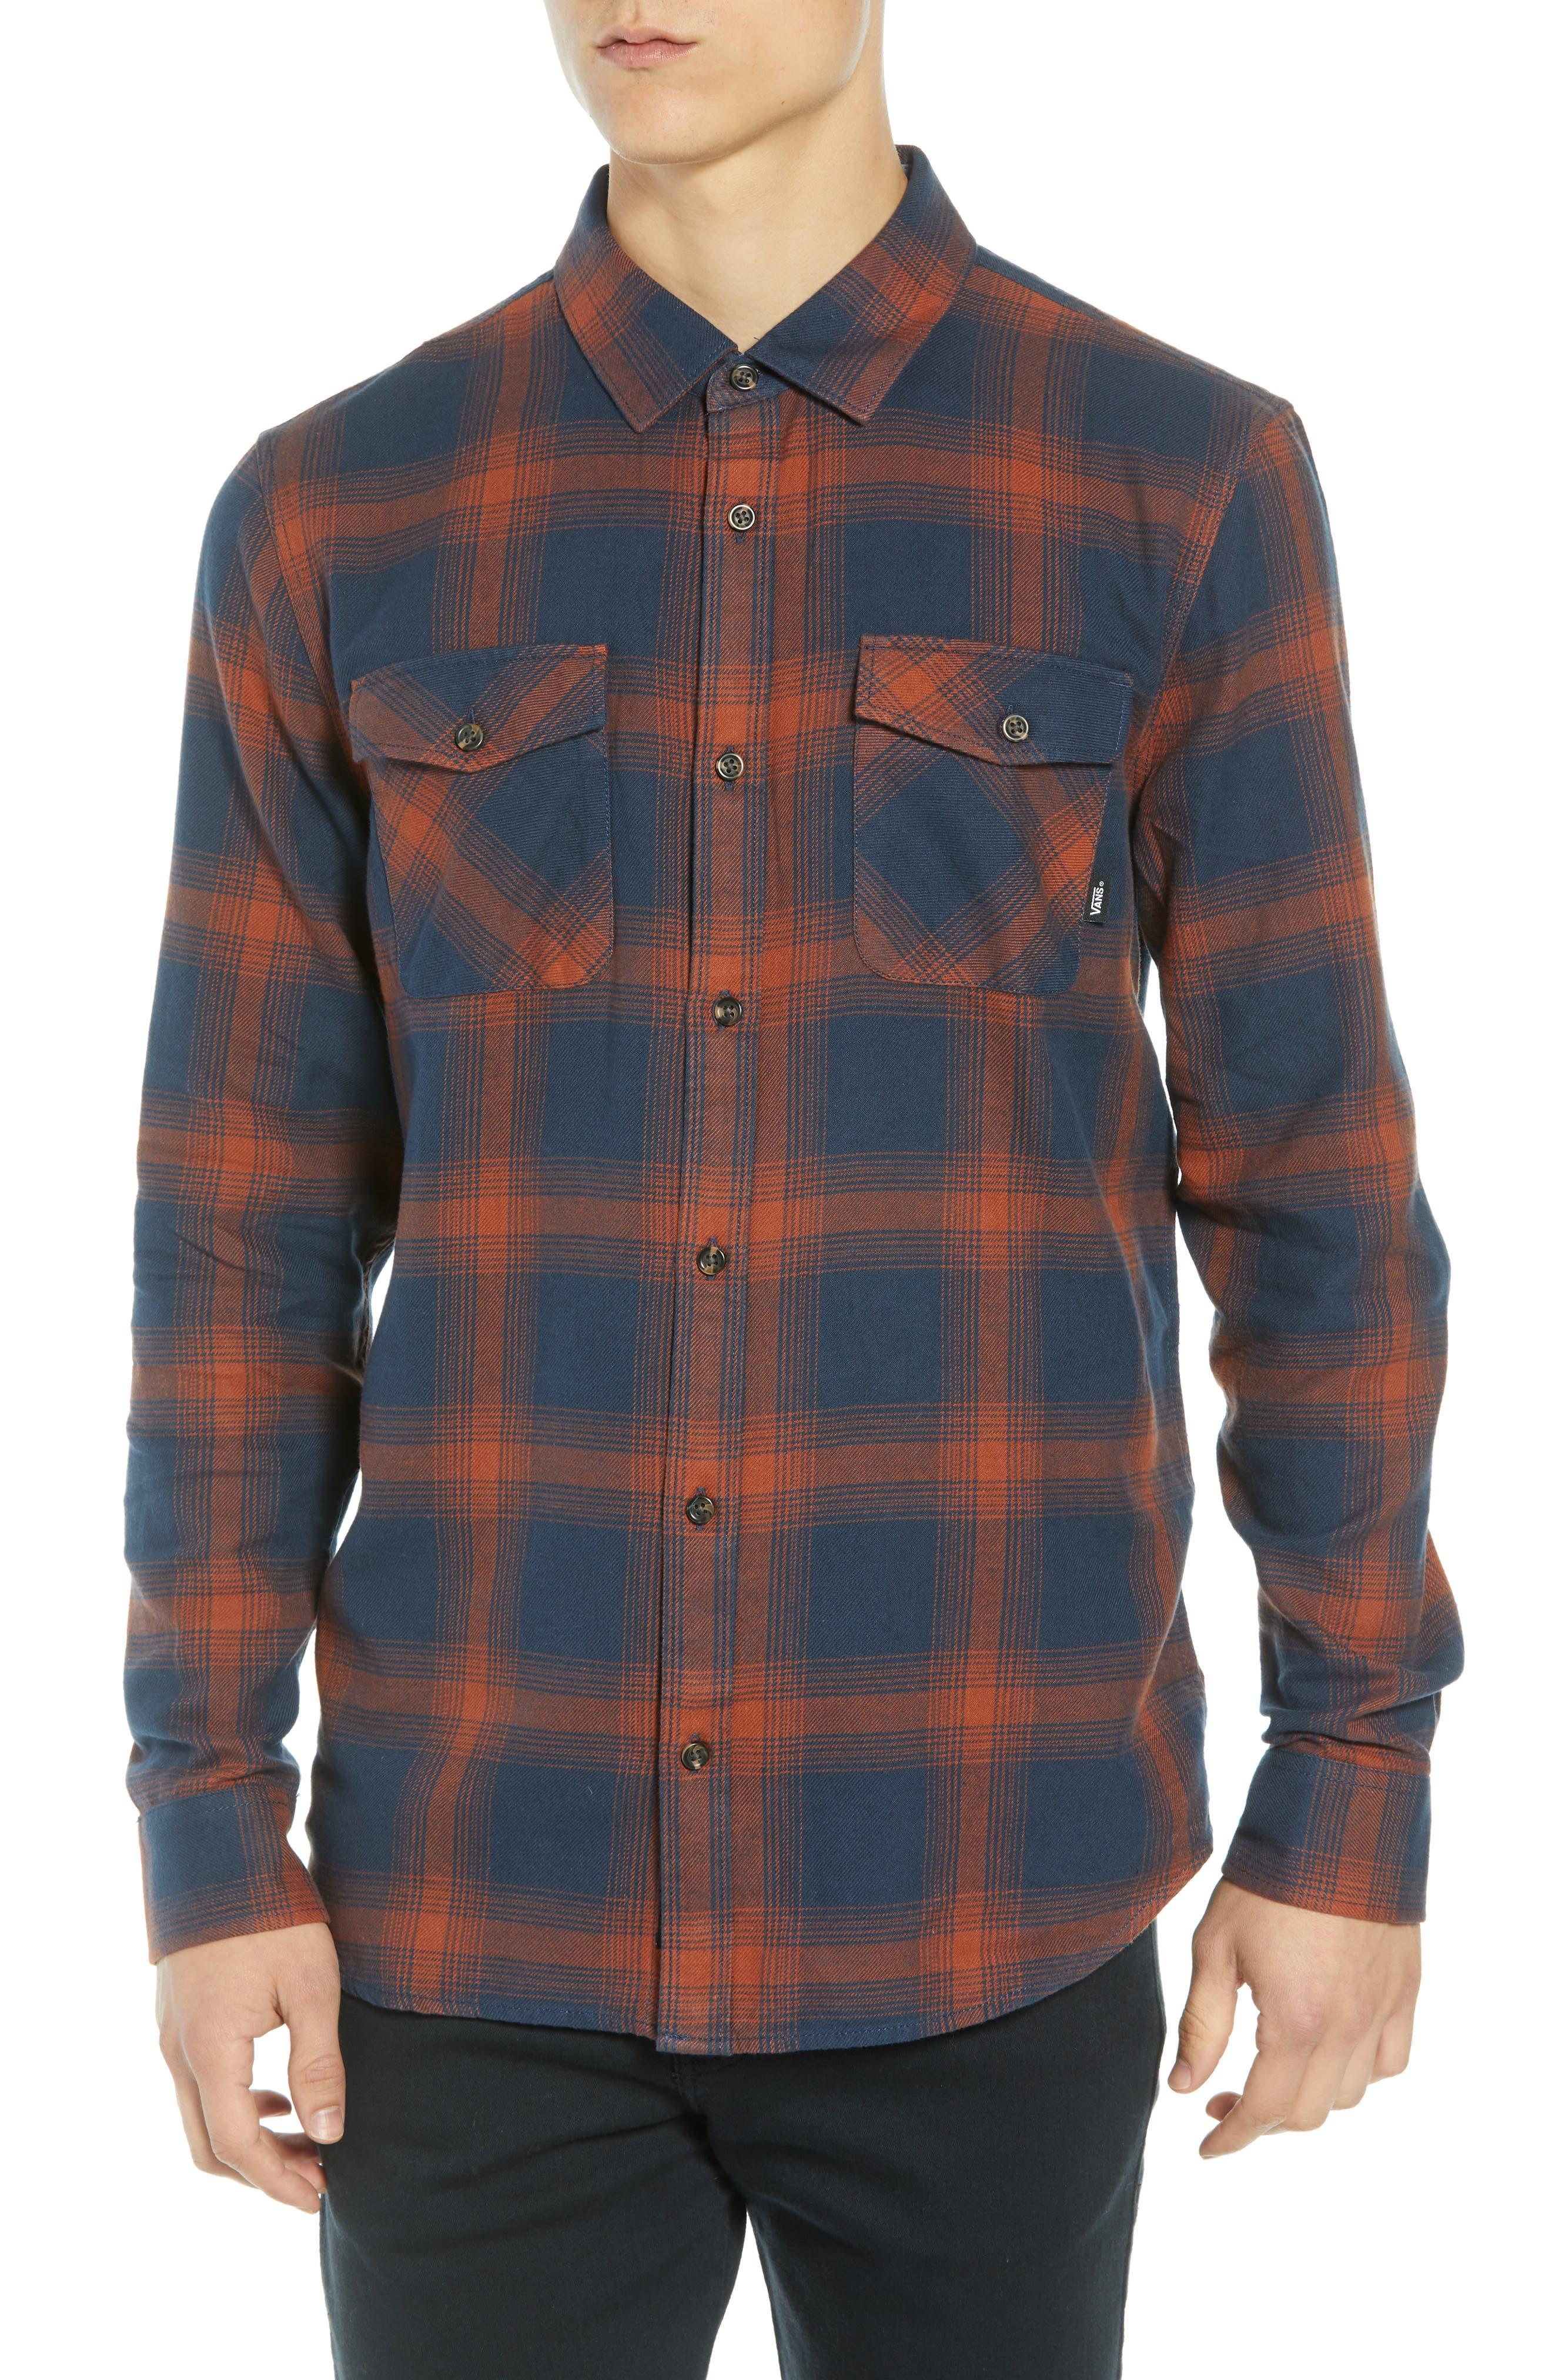 Monterey III Plaid Flannel Shirt,                             Main thumbnail 1, color,                             DRESS BLUES/ SEQUOIA